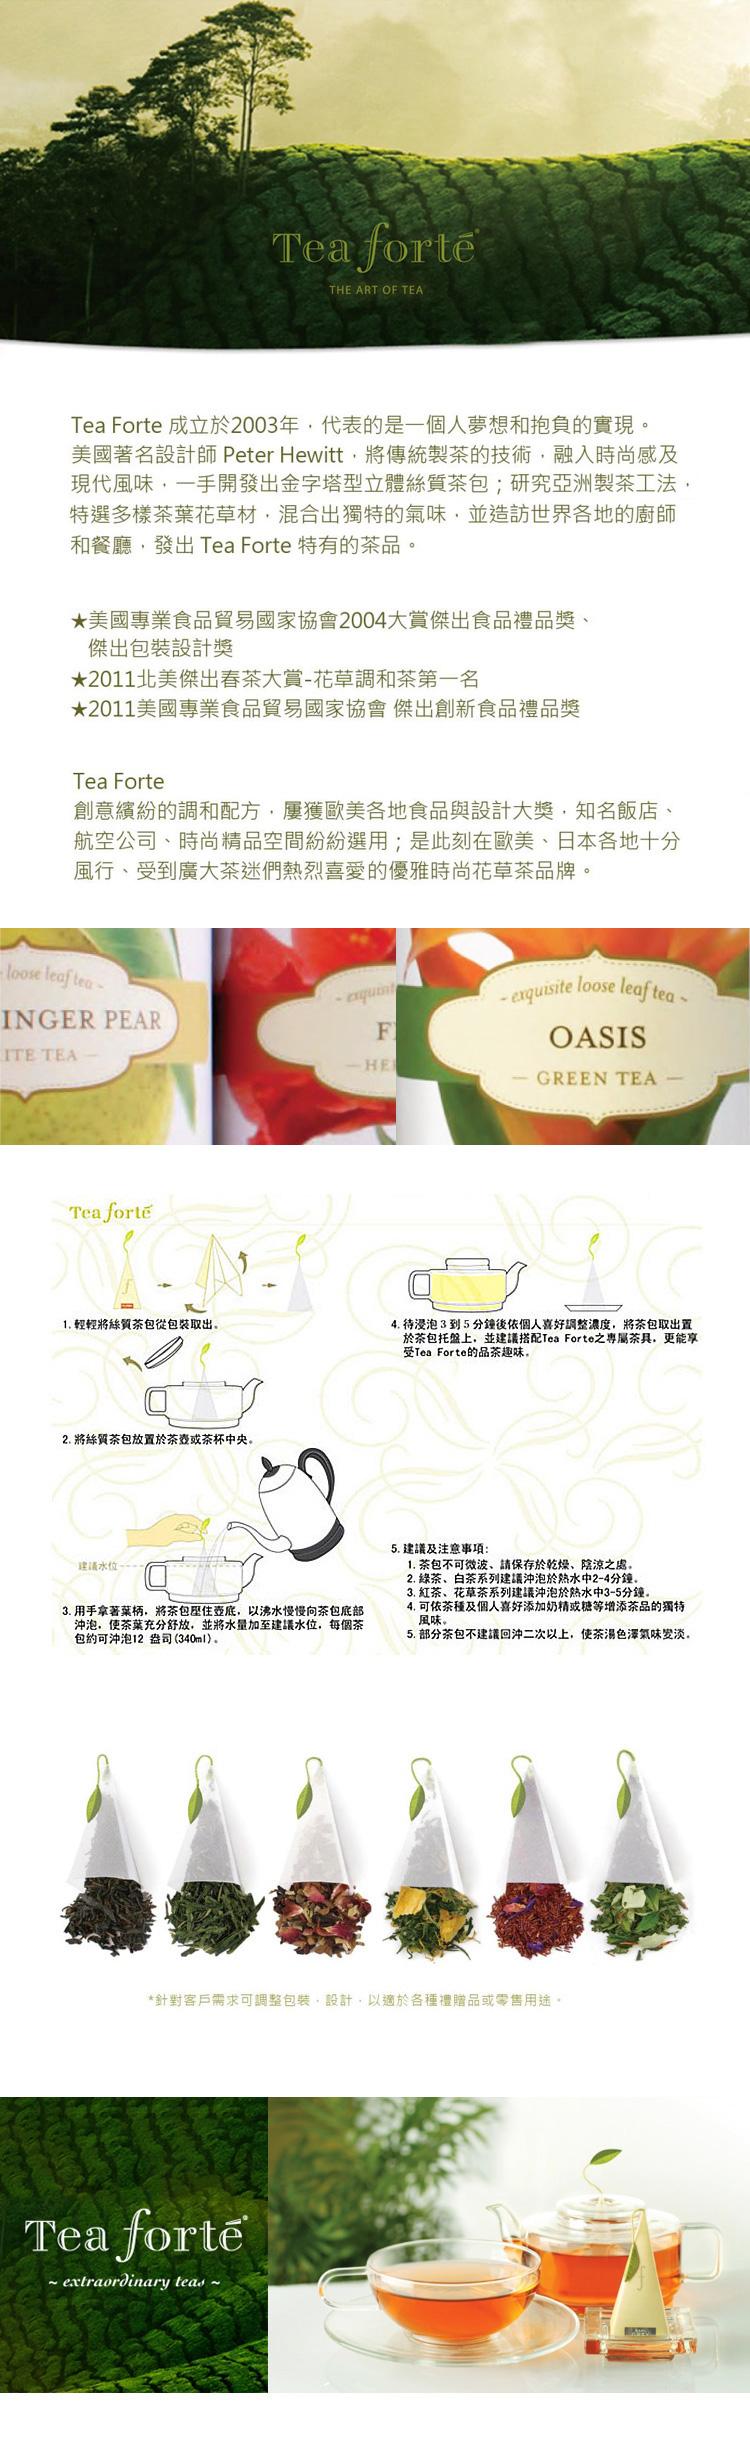 Tea Forte 2入陶瓷方型茶托(草綠)